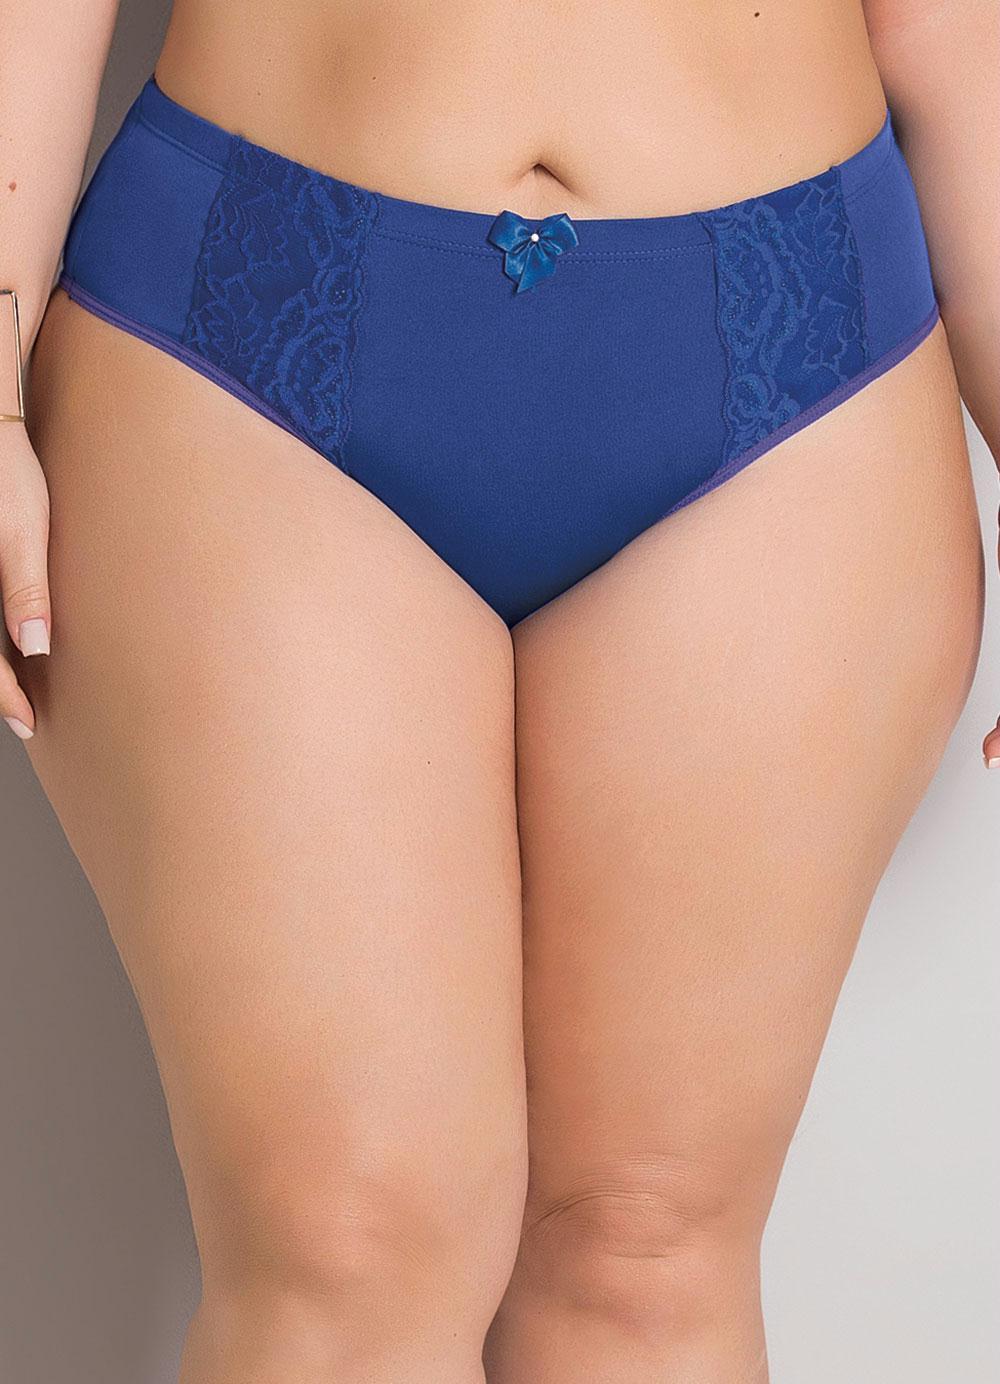 Calcinha Biquíni Plus Size Azul Christian Gray - Christian Gray b74b6f40556